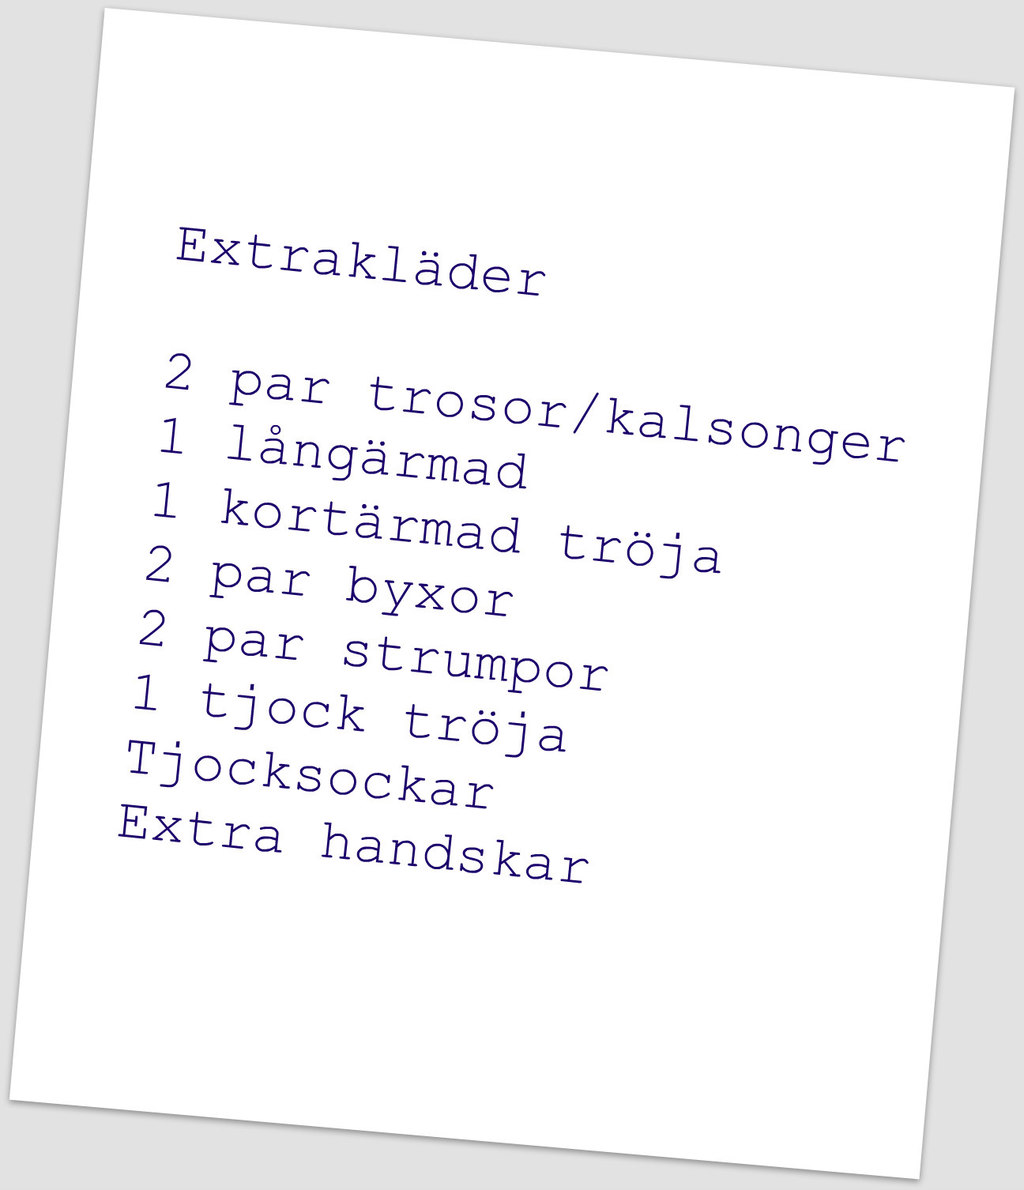 Extrakläder